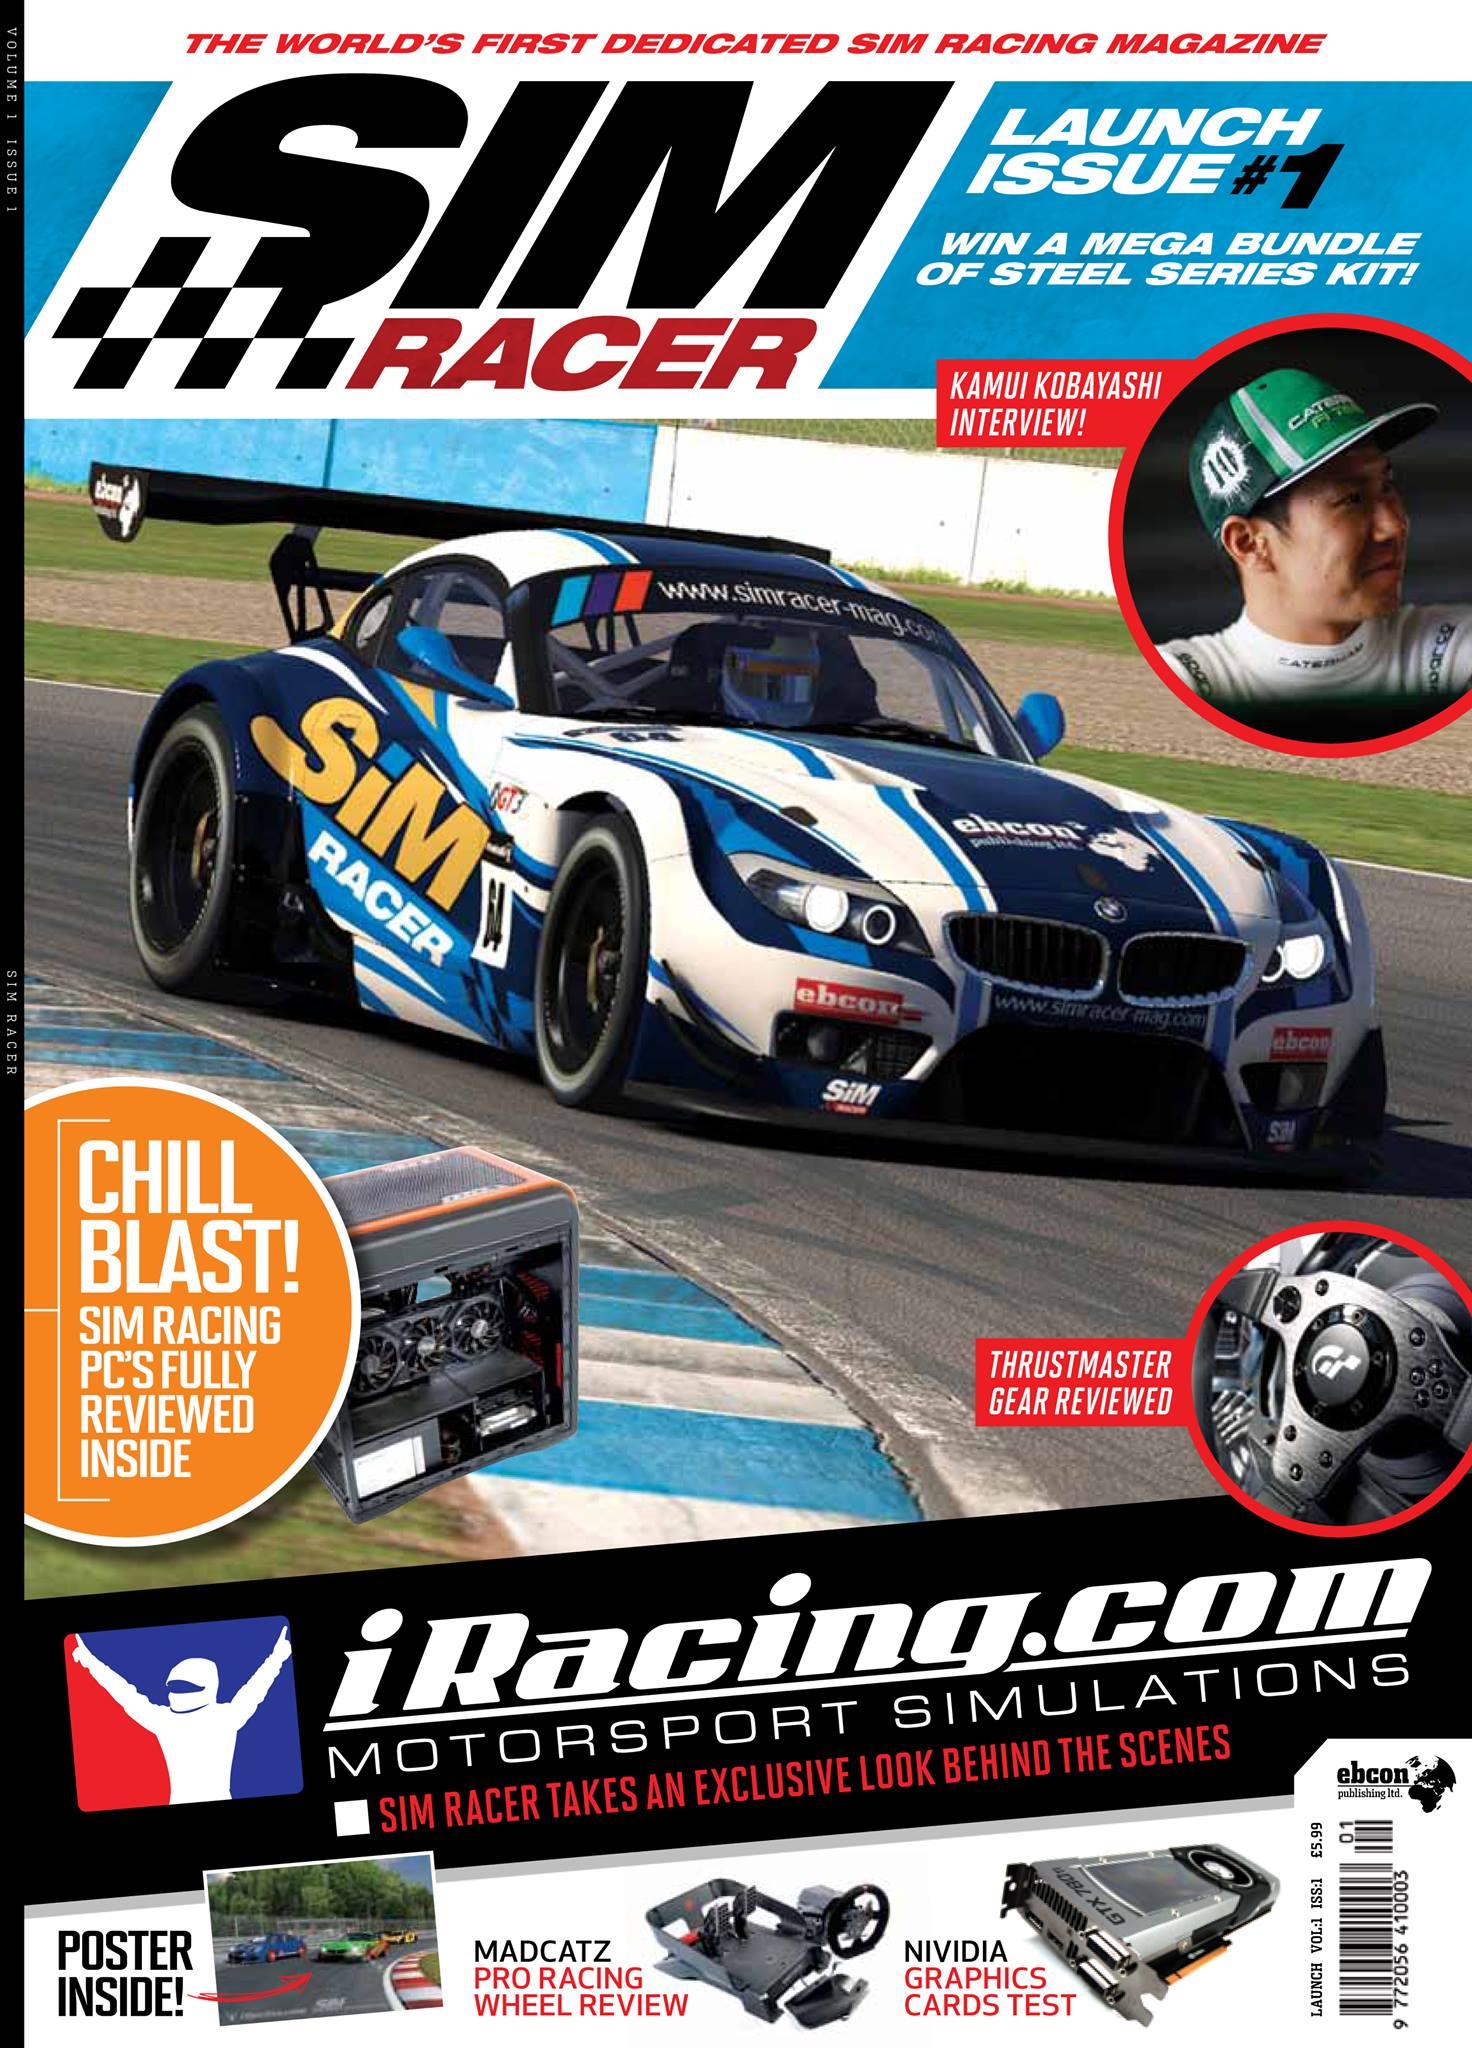 Mclaren For Sale >> Sim Racer Magazine – Out Next Week – VirtualR.net – 100% Independent Sim Racing News